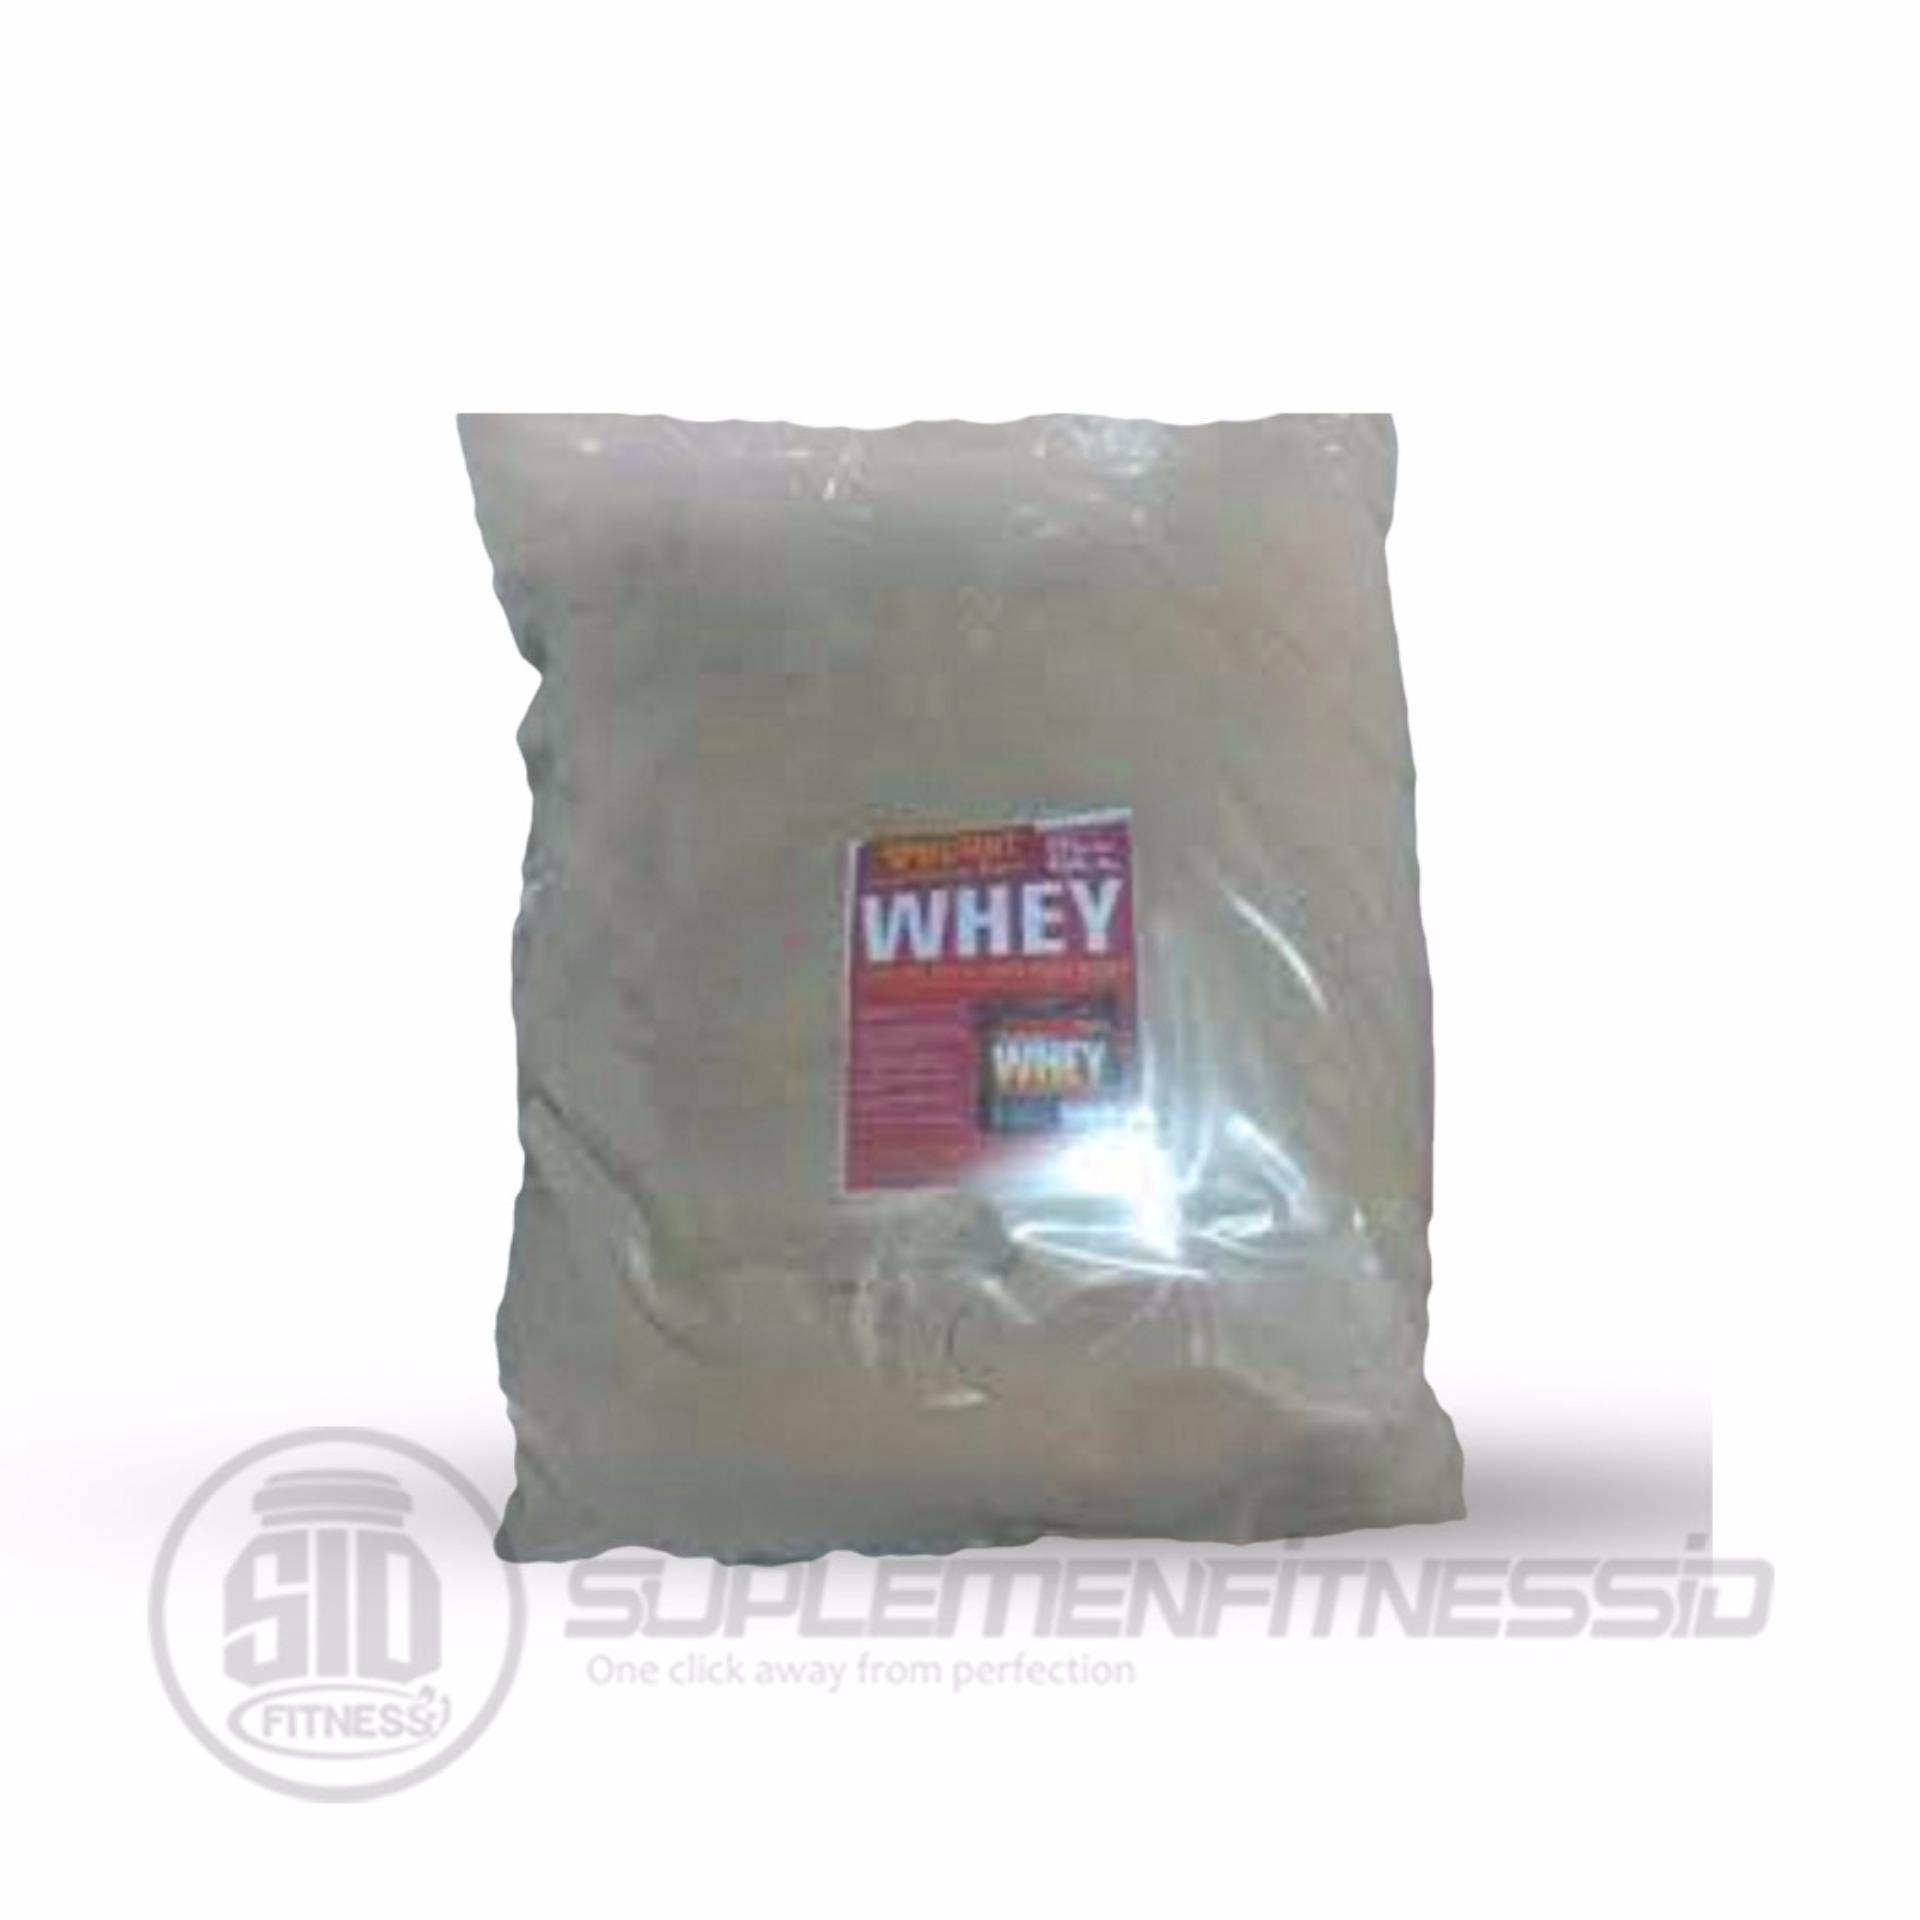 Home · Dymatize Nutrition Super Mass Gainer 12lb New Packaging Resmi Lisensi Dni Dan Bpom; Page - 5. Mutant Whey 2 lb Rasa Cokelat lisensi BPOM